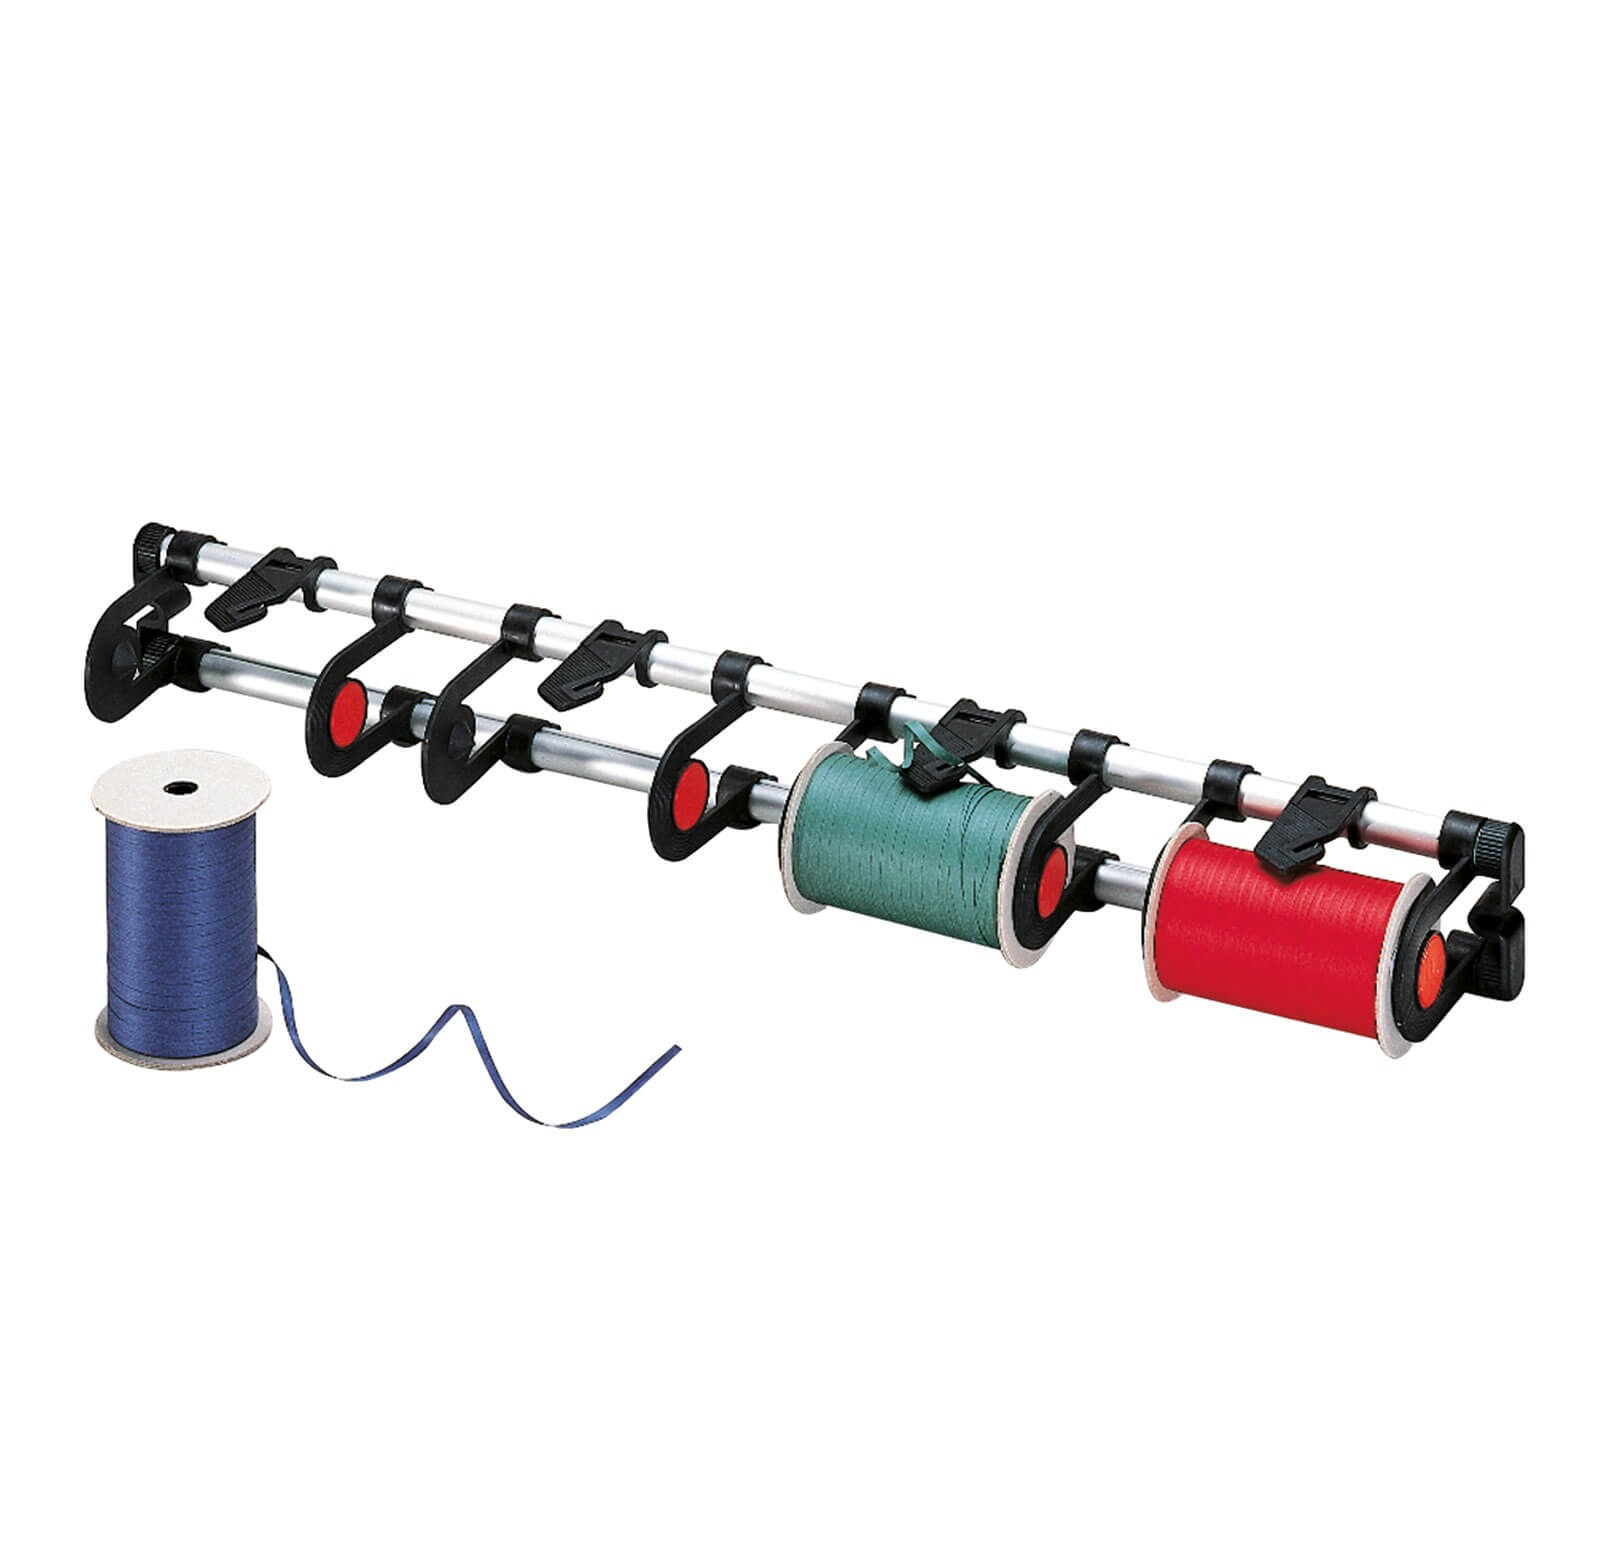 4-bobines svolgitori lame integrate